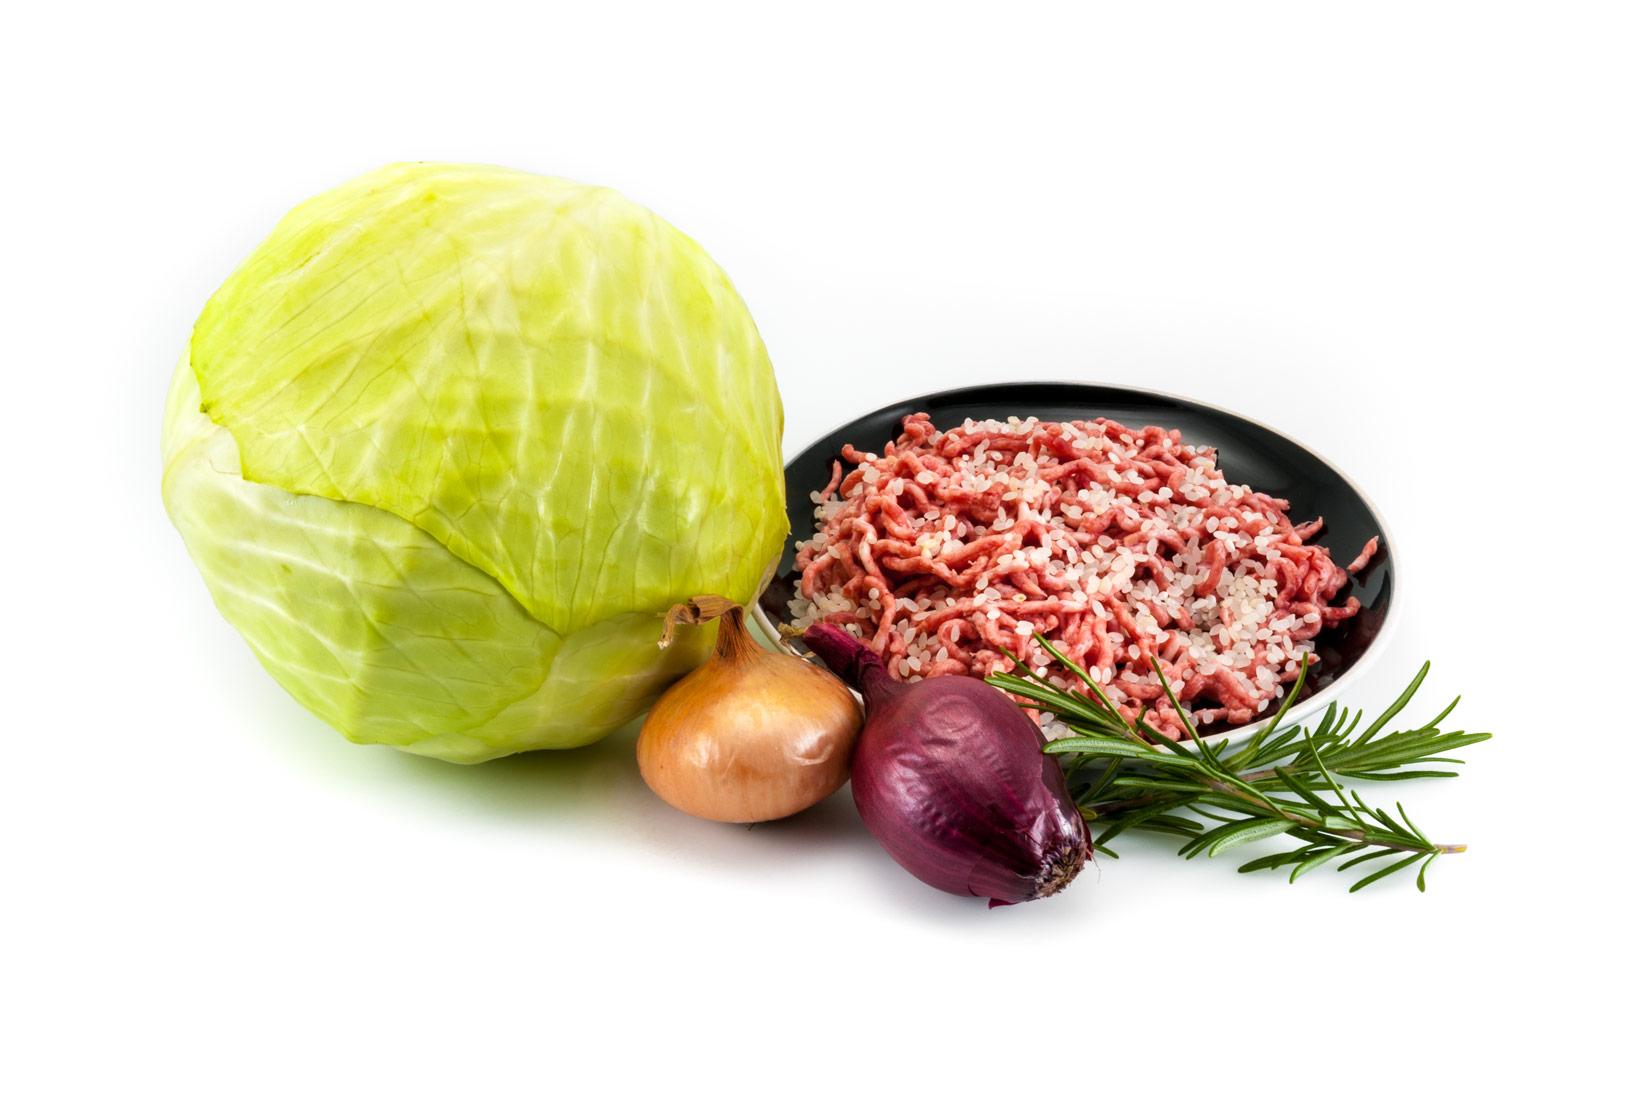 Hlávka zelí a mleté maso základ pro Lachanodolmades